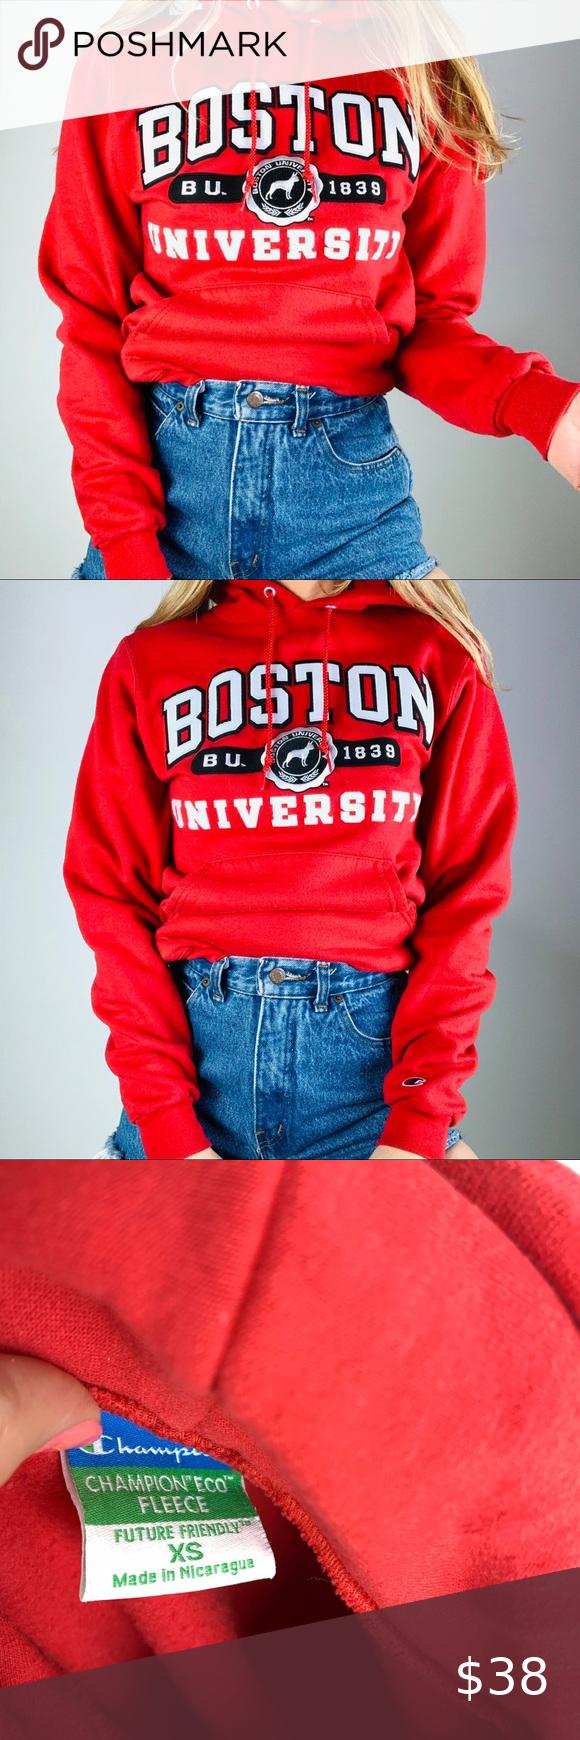 Champion Boston University Hoodie Sweatshirt Xs Sweatshirts Hoodie Embroidered Hoodie Sweatshirts Sweatshirts [ 1740 x 580 Pixel ]